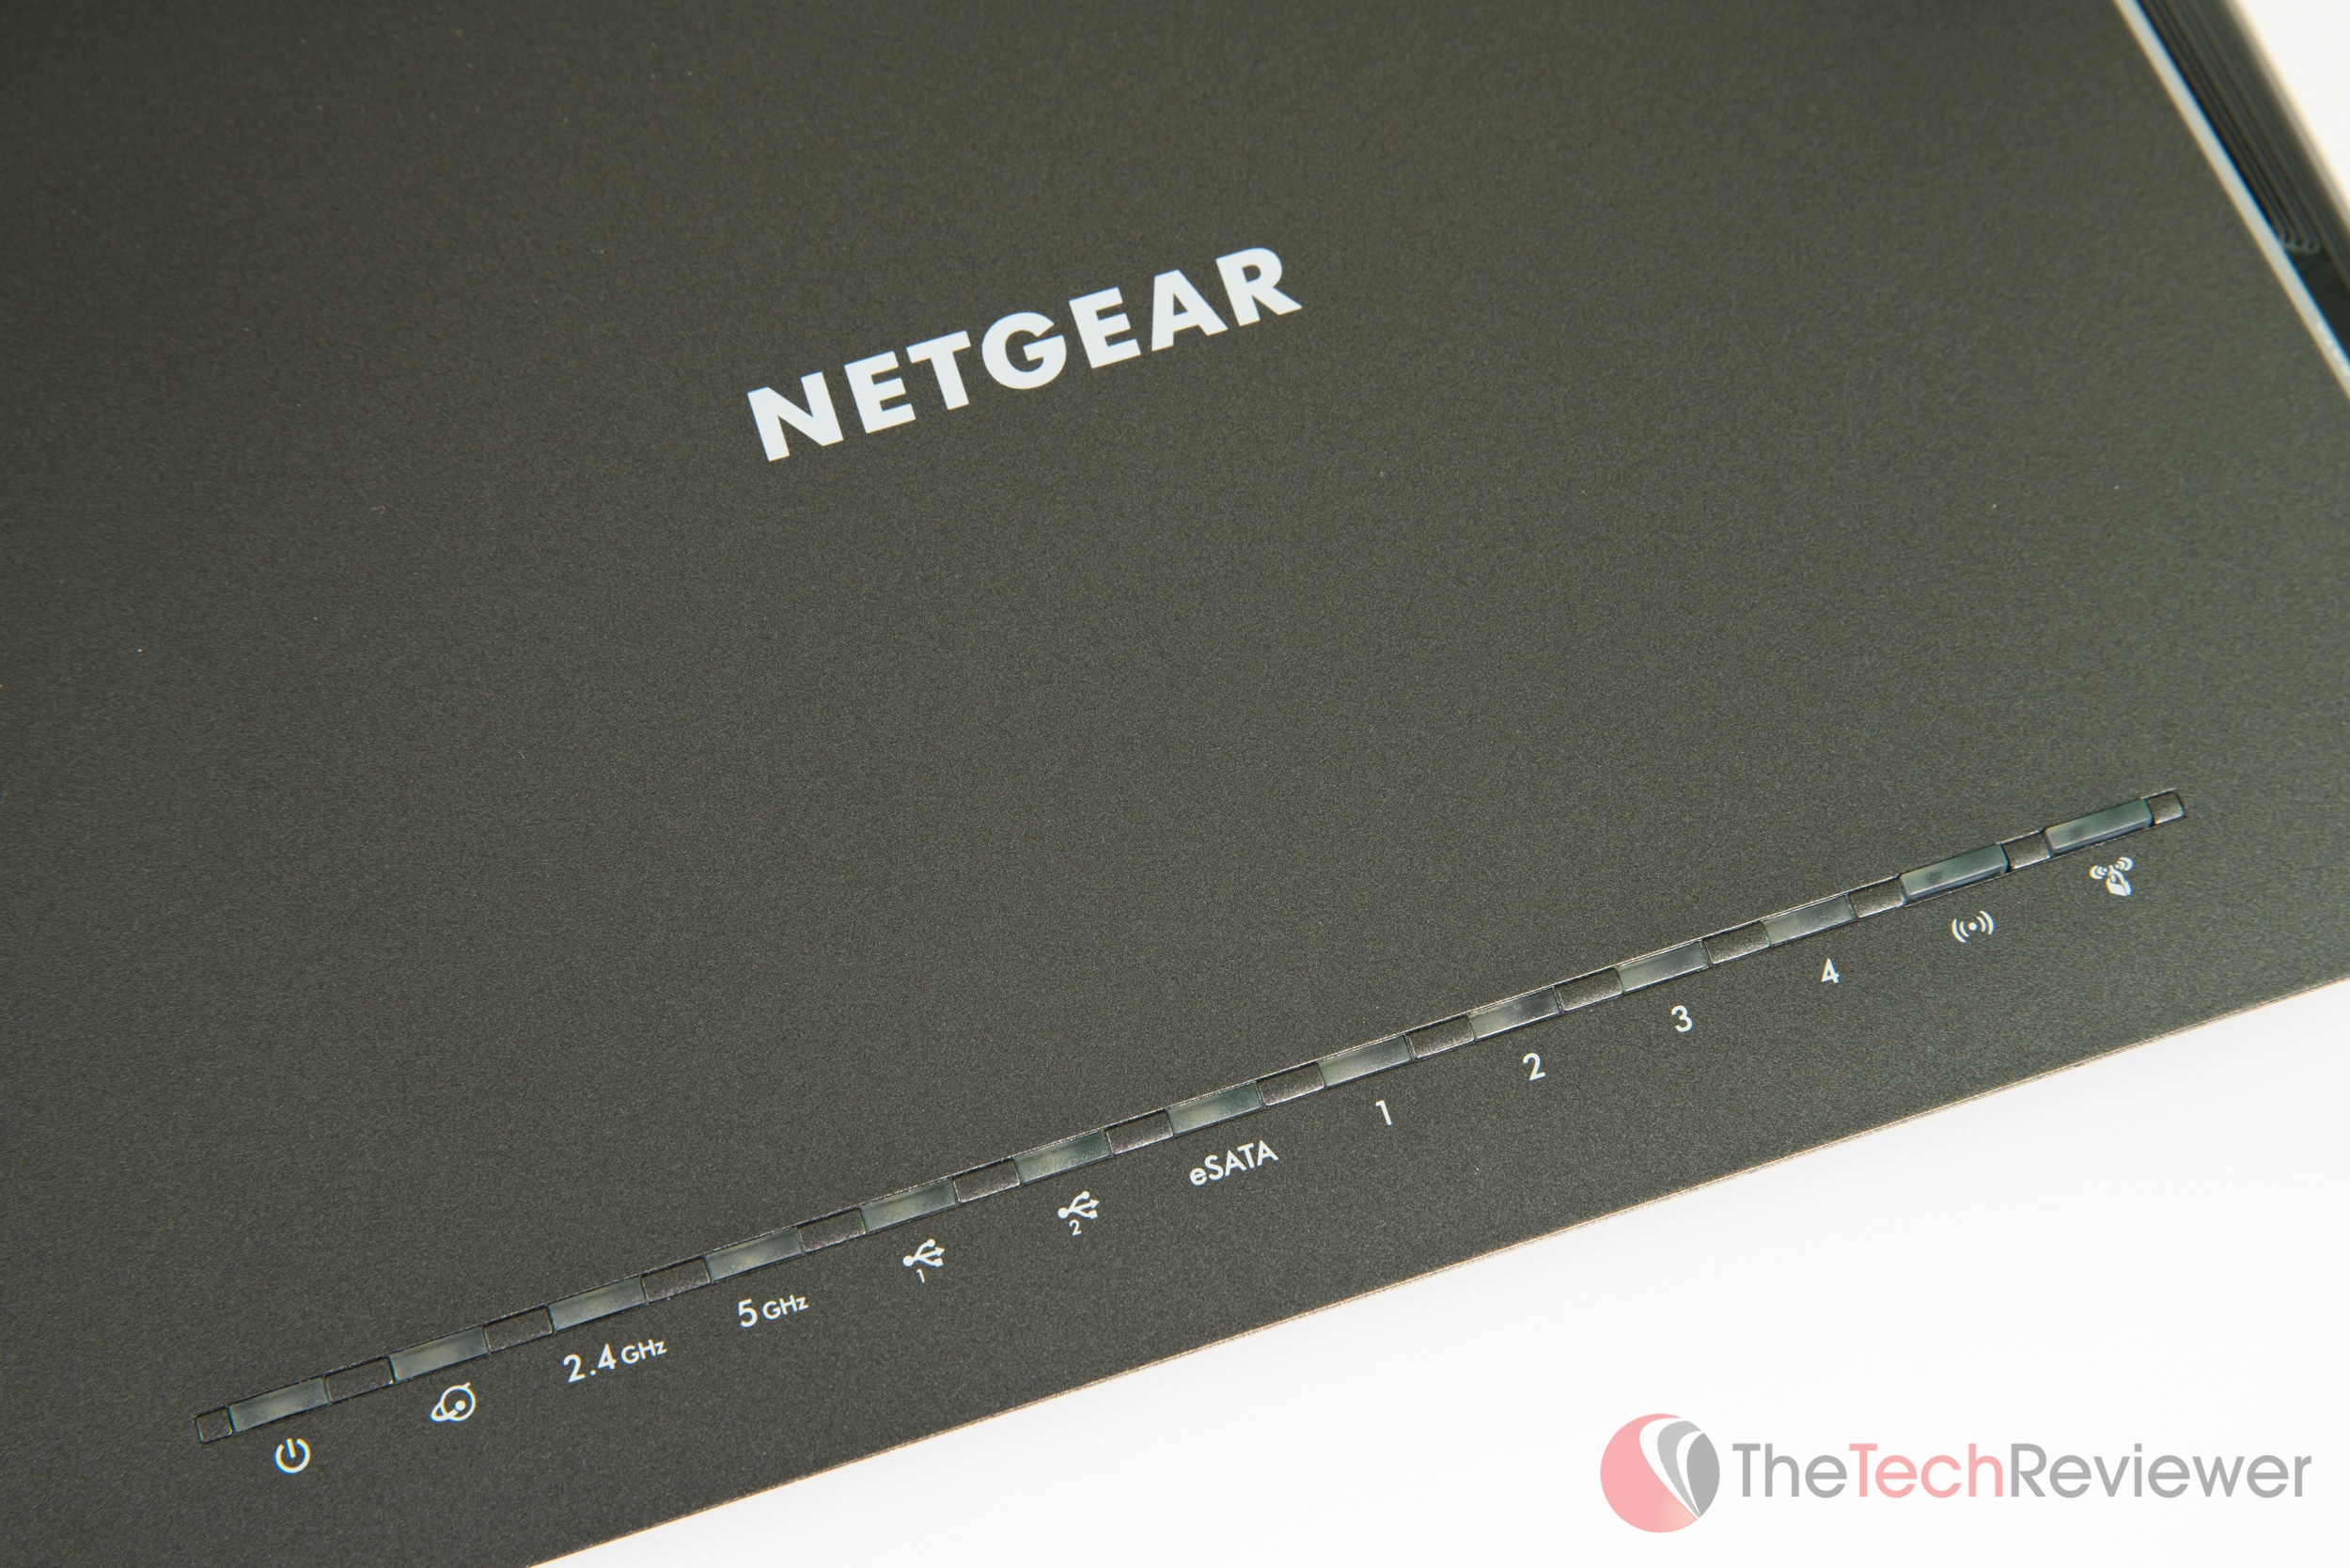 Netgear%20Nighthawk%20X4s-5